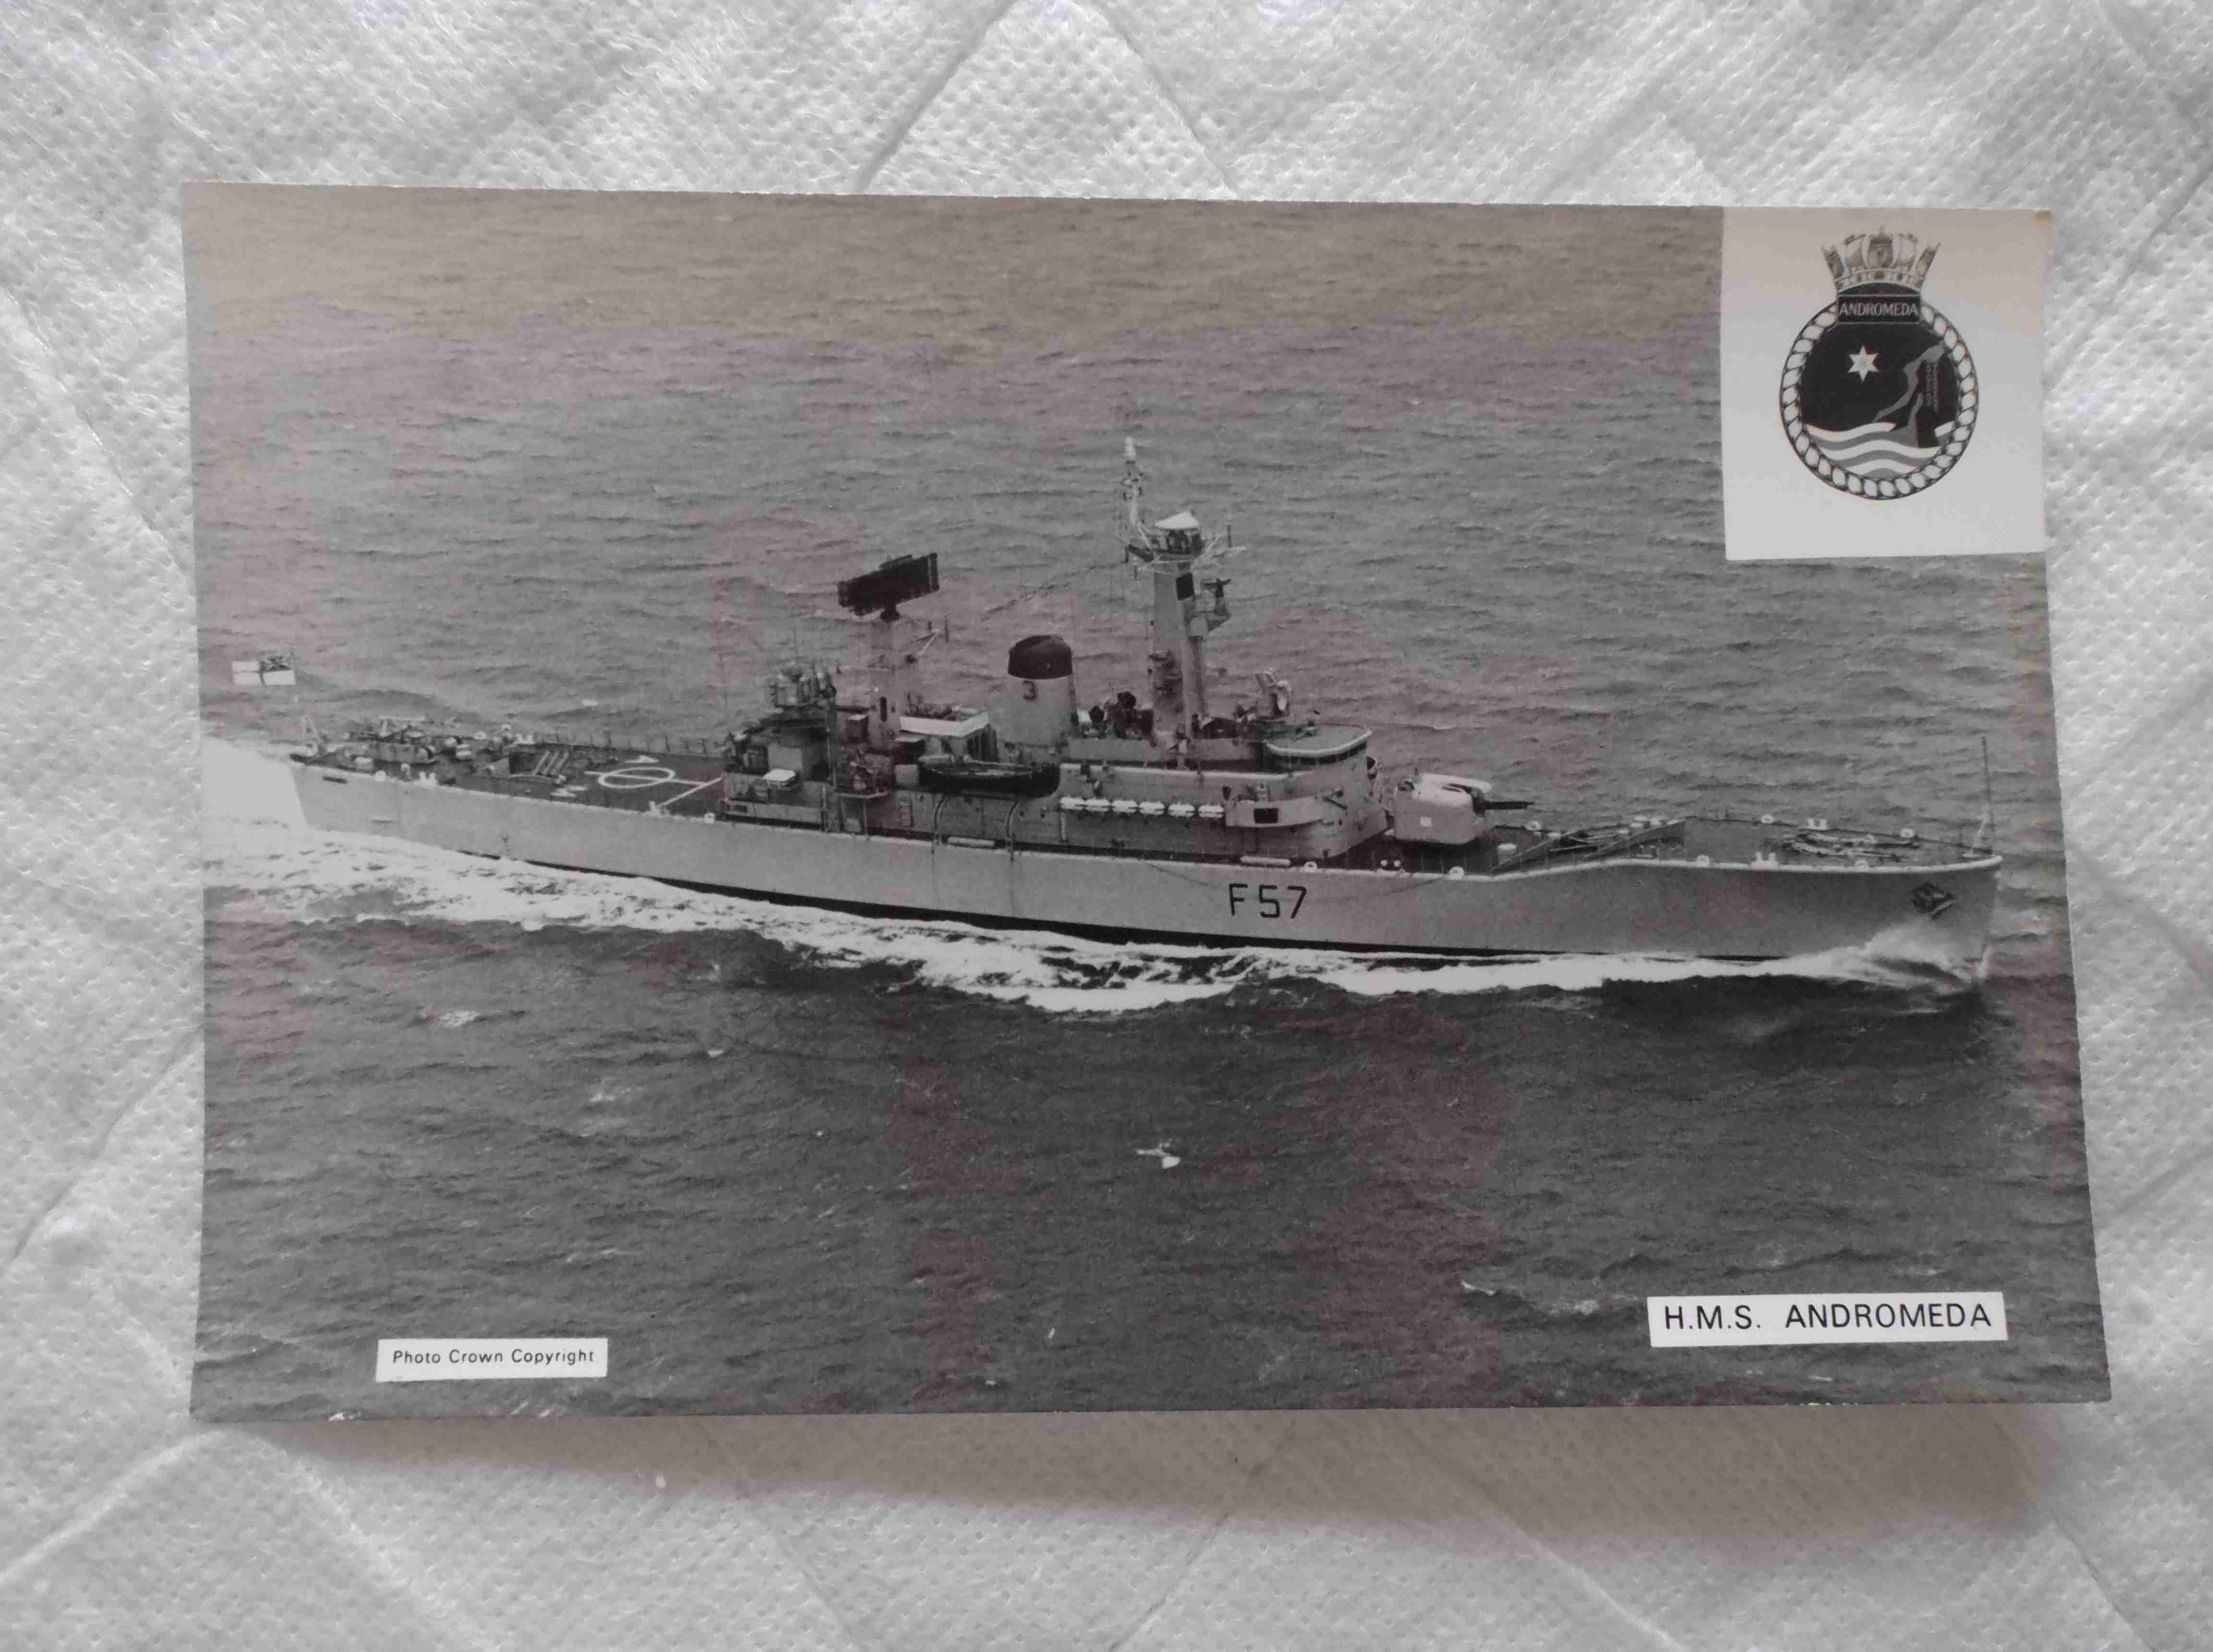 POSTCARD SIZE PHOTOGRAPH OF THE ROYAL NAVAL VESSEL HMS ANDROMEDA